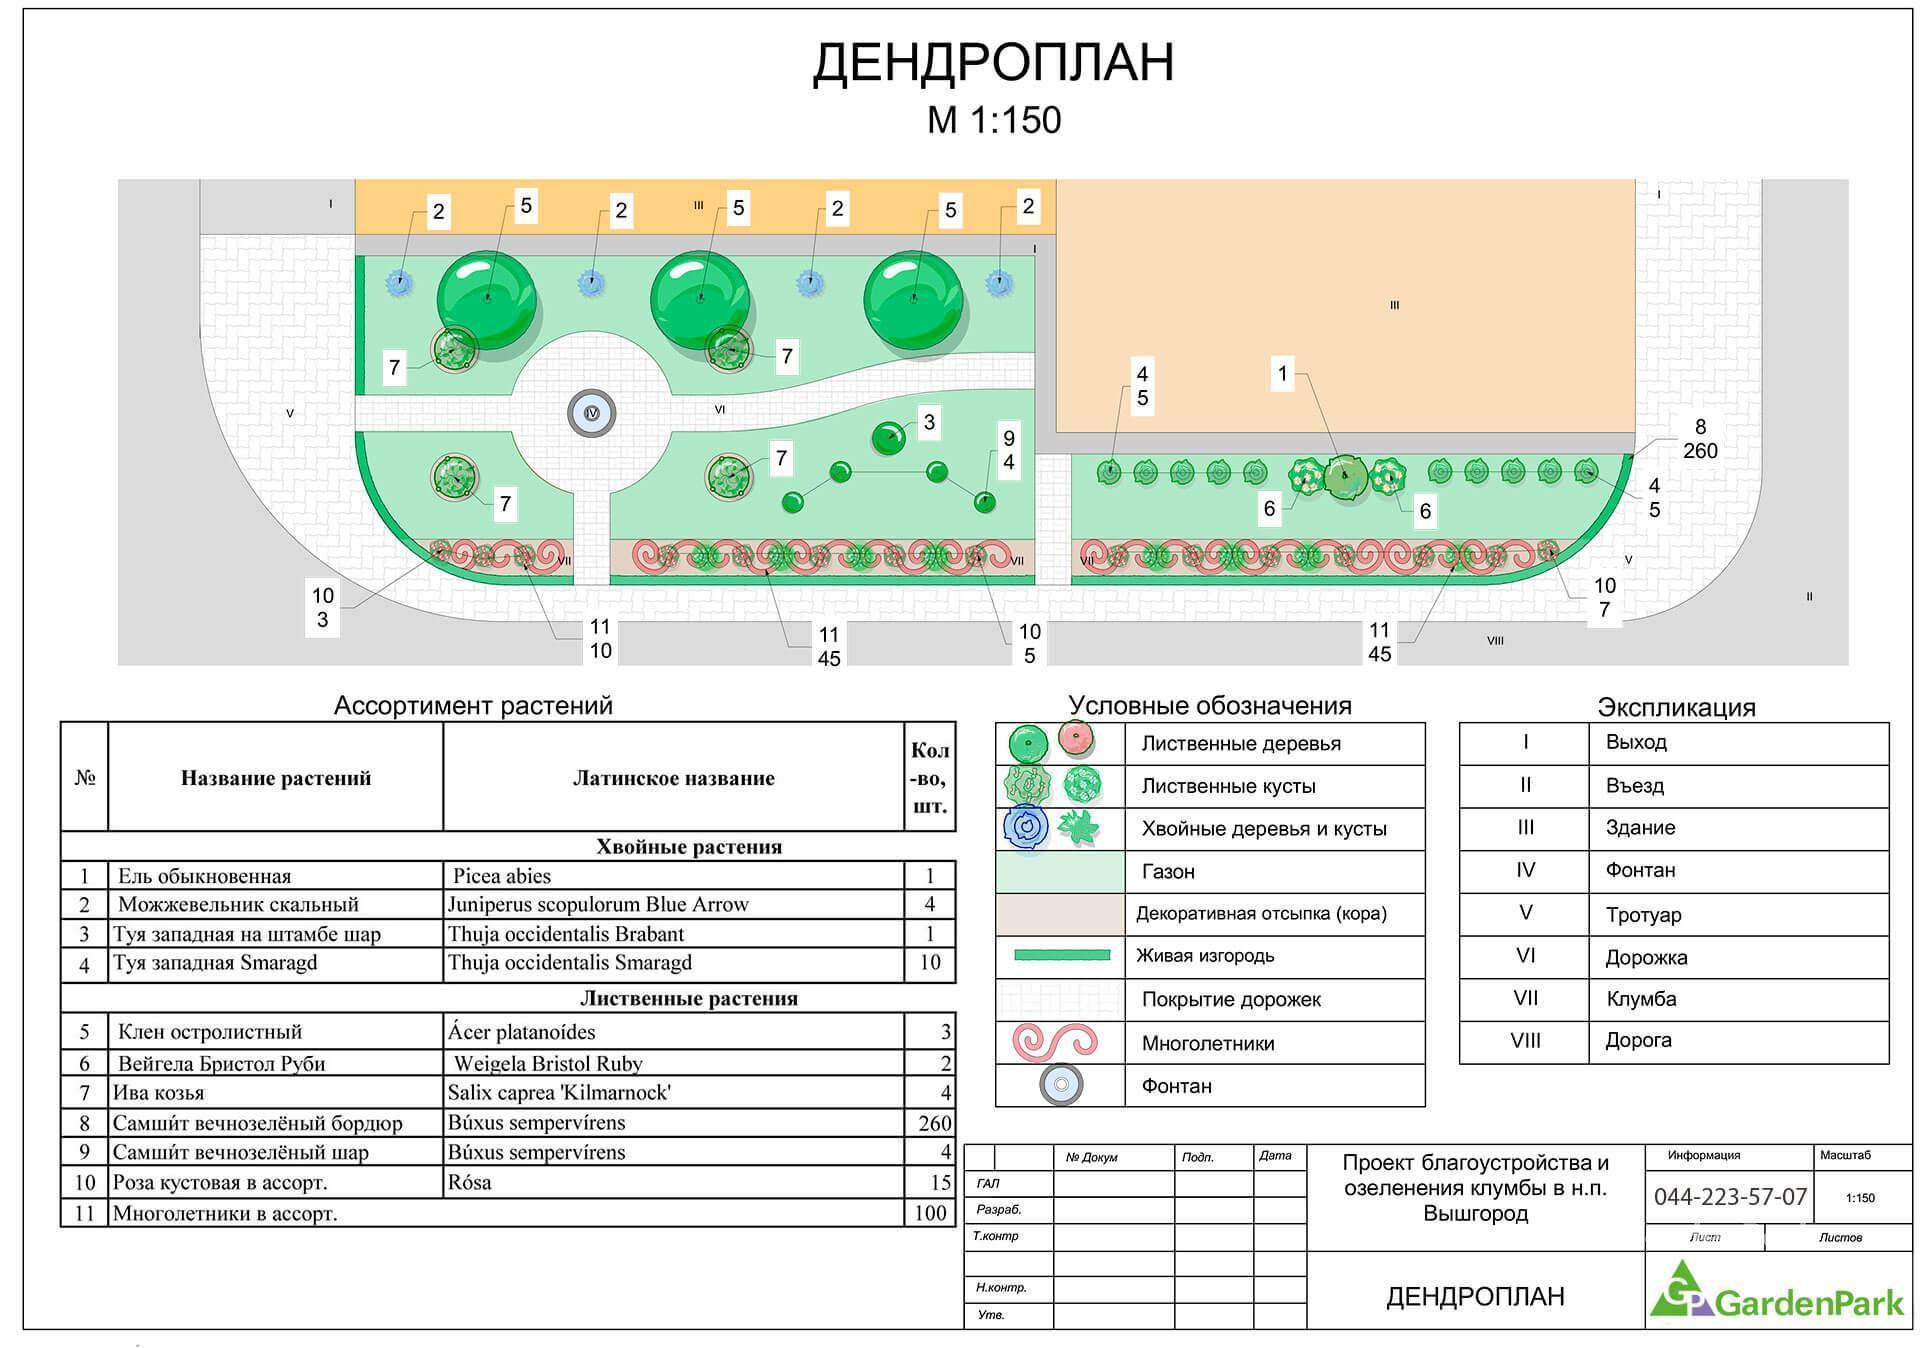 Проект Вышгород